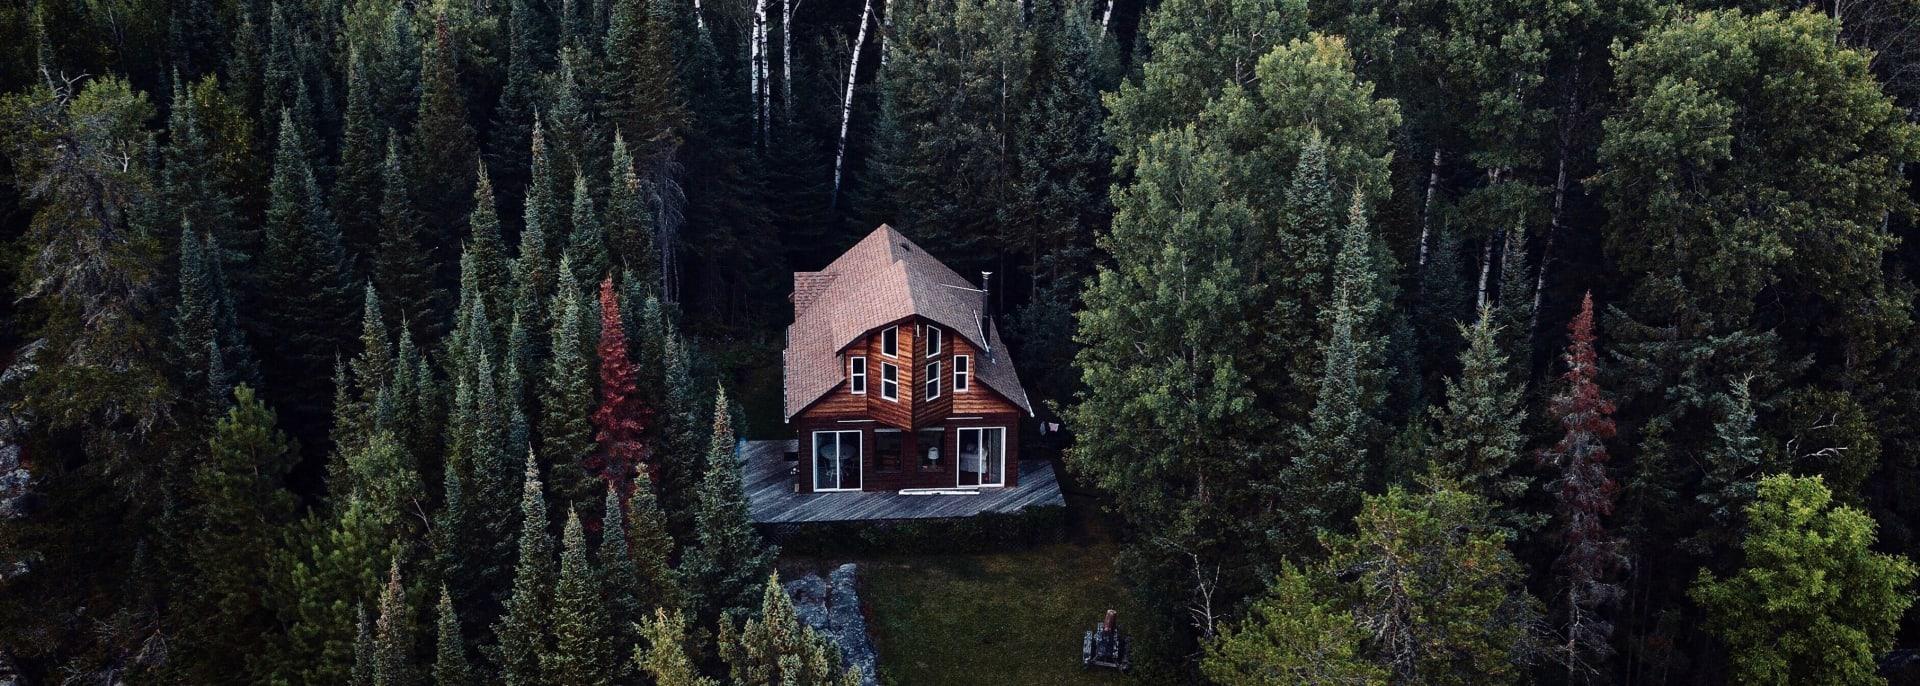 Luxuriöse Waldhütte, Alaska